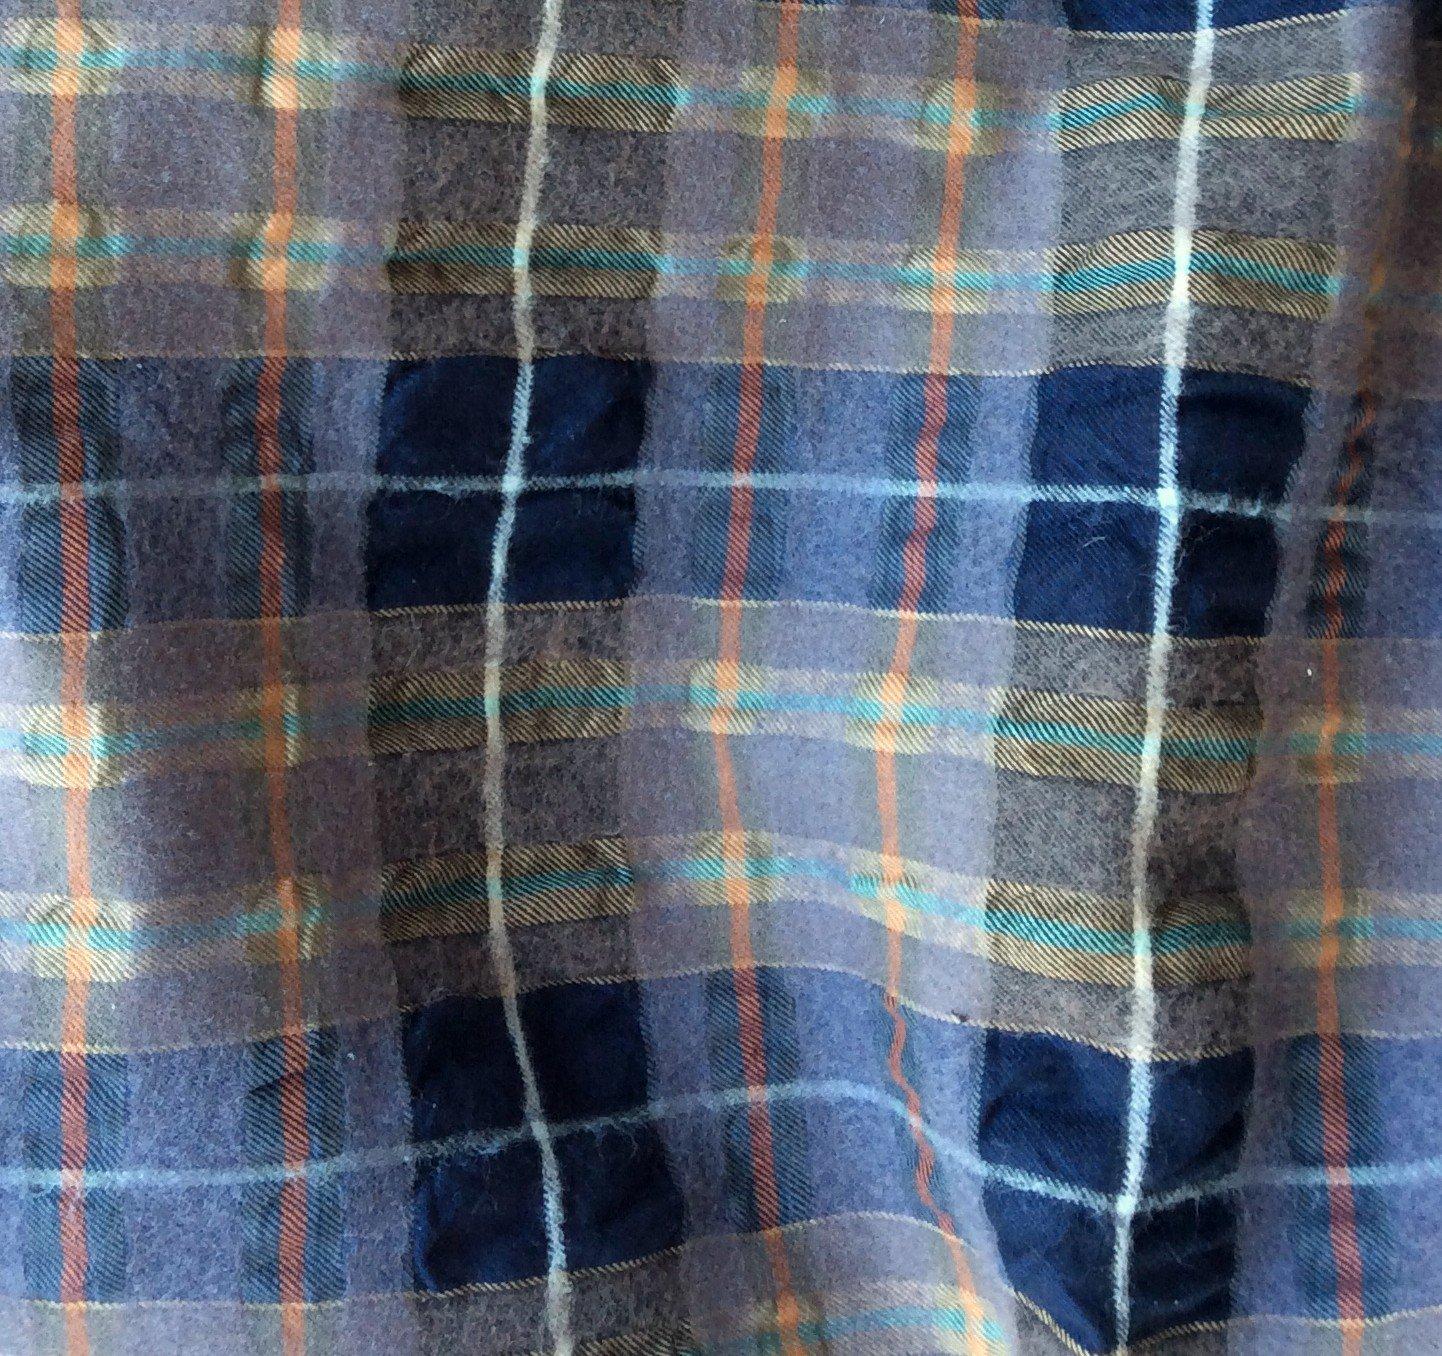 Tissu ecossais marine gris orange cloqué